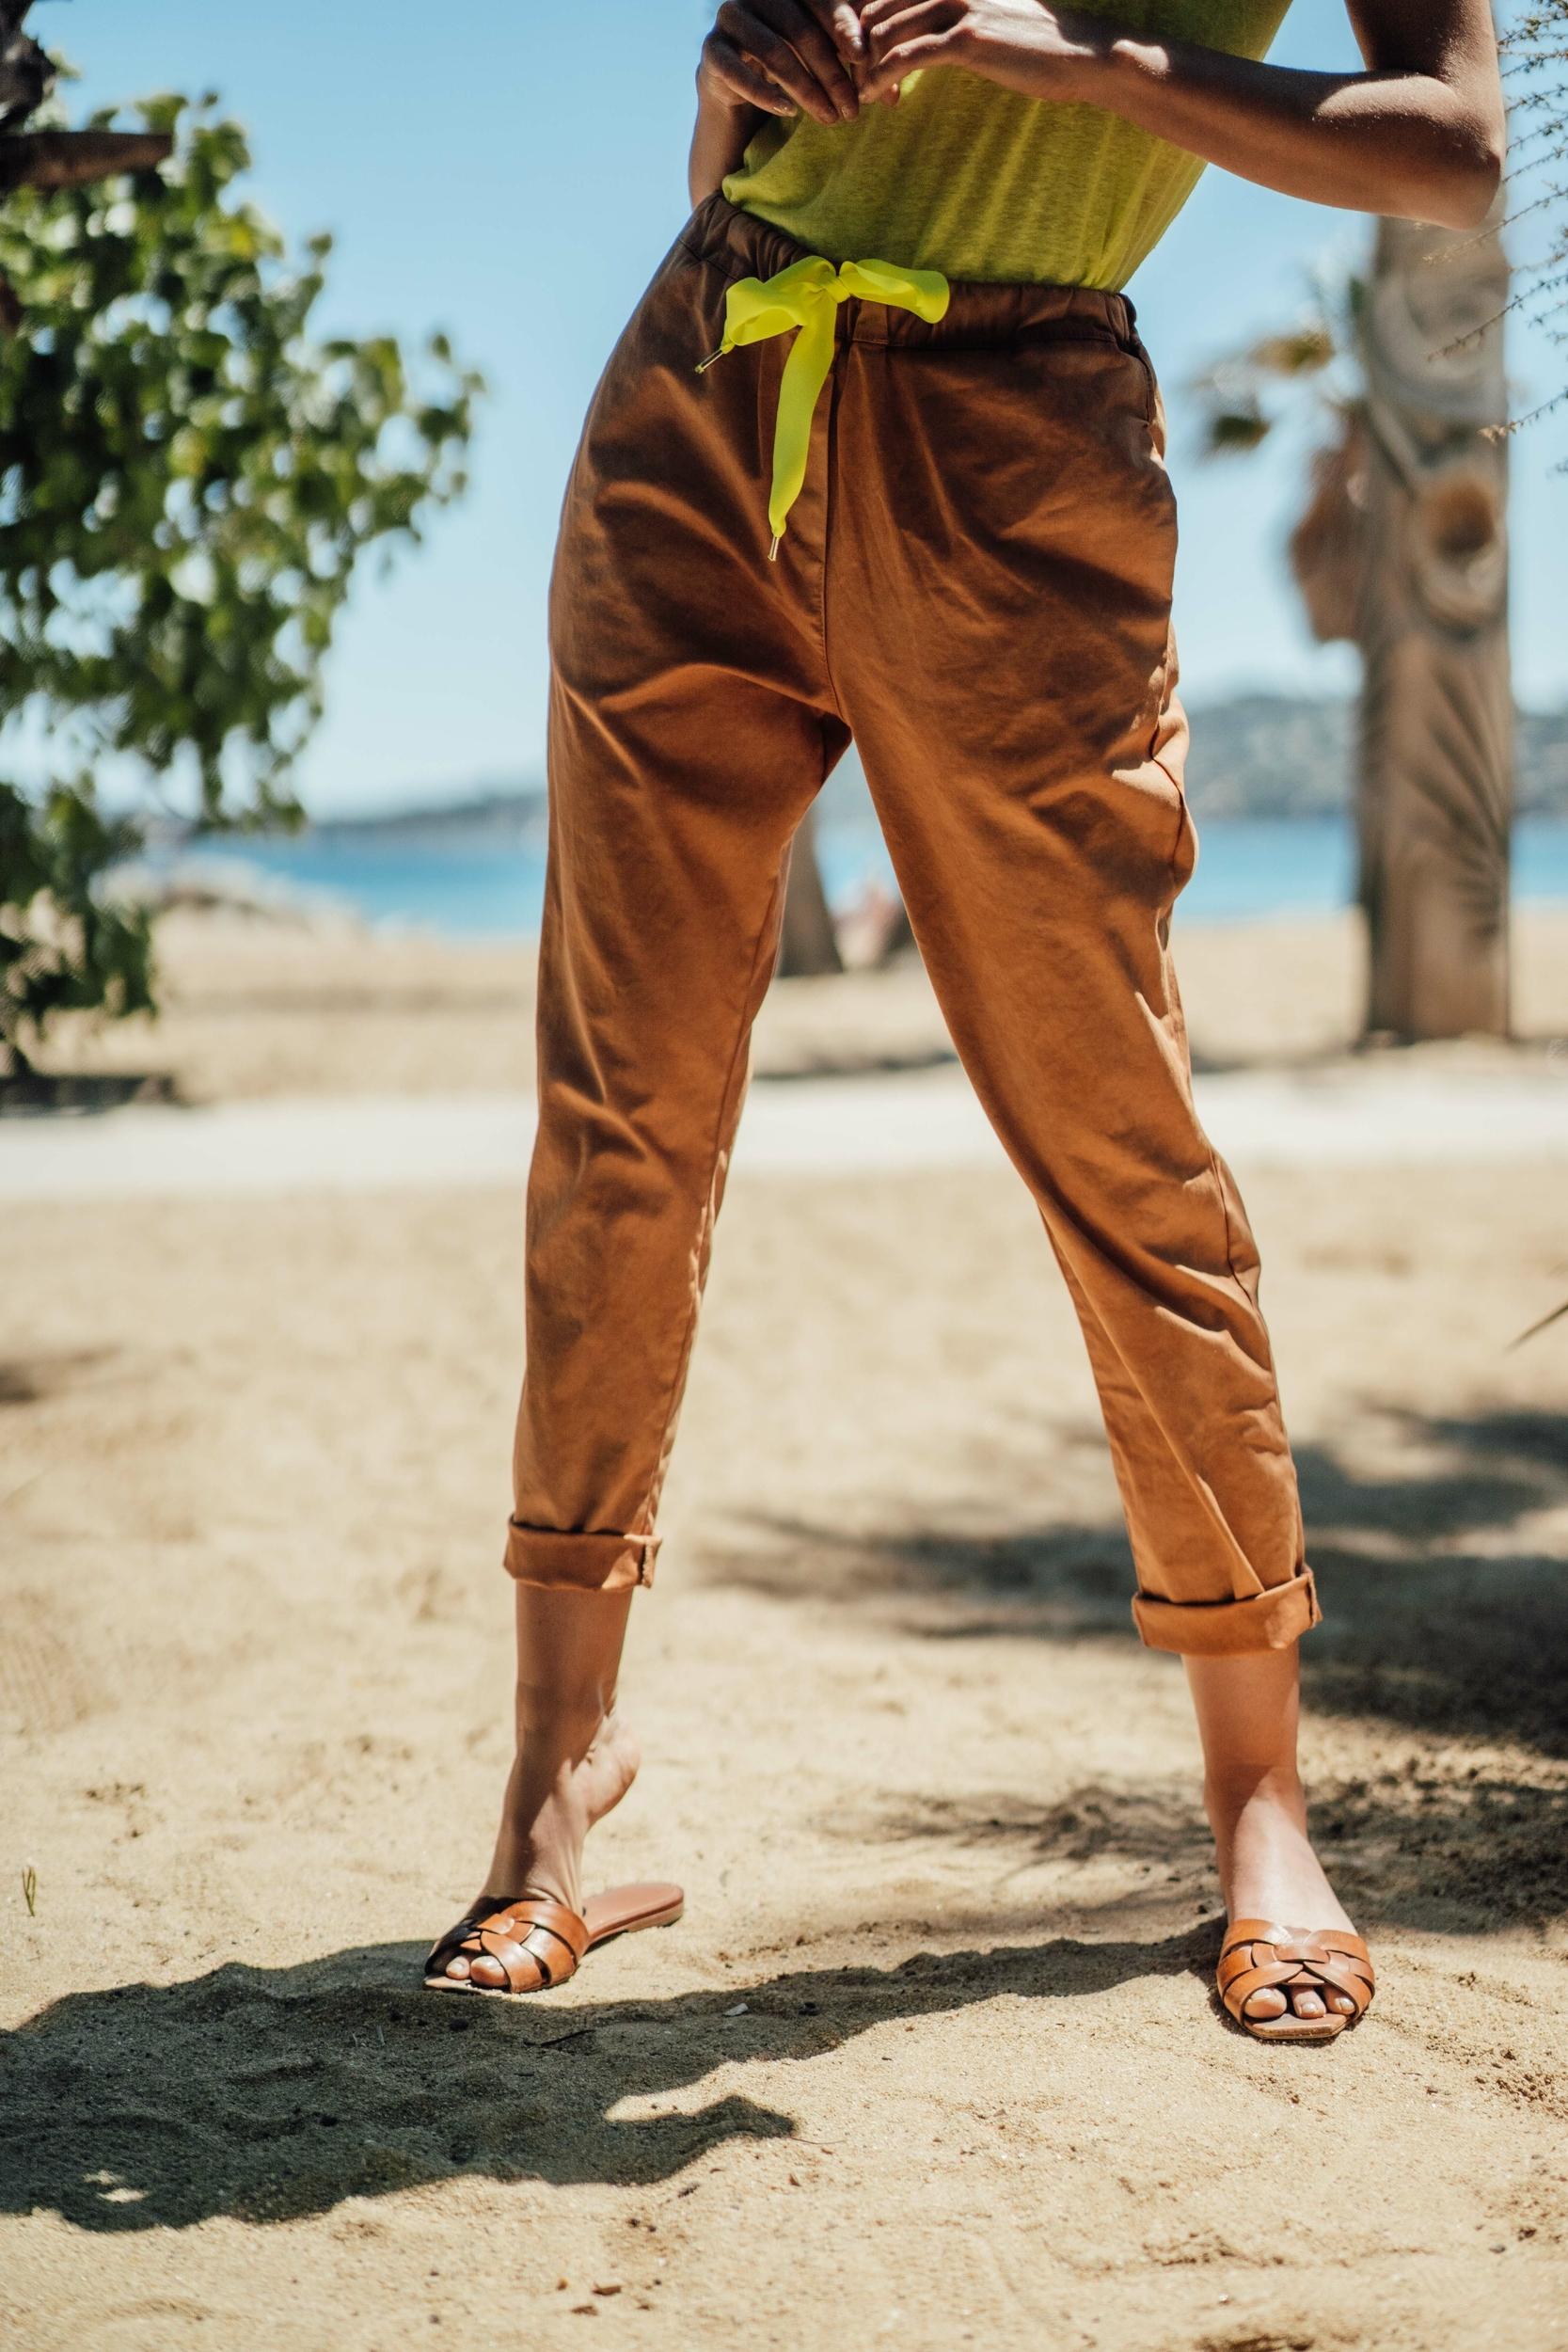 Pantalon JOE camel/jaune fluo Banditas